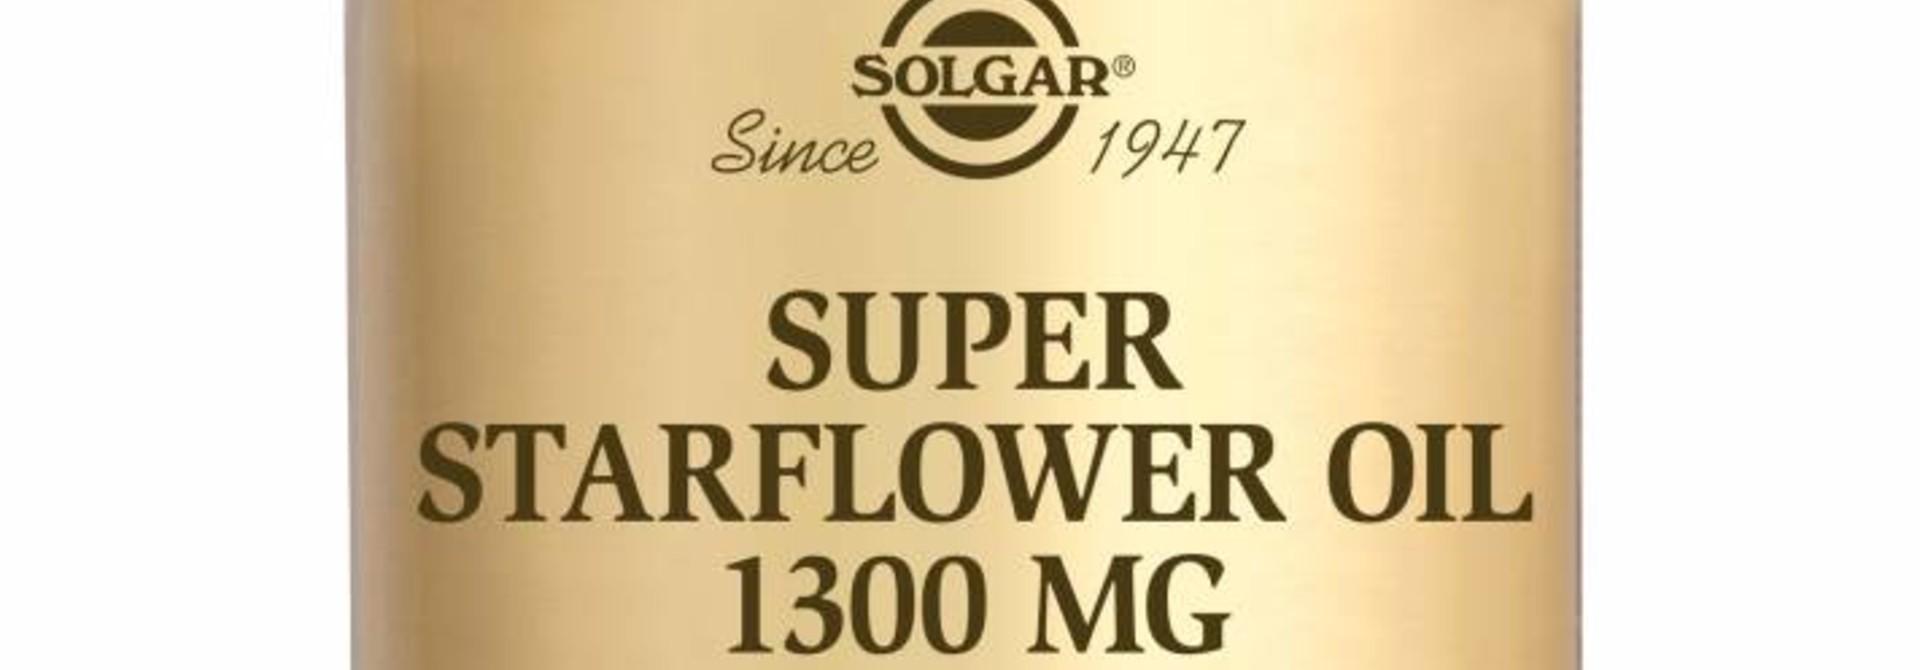 Super Starflower Oil 1300 mg (300 mg GLA) 30 softgels